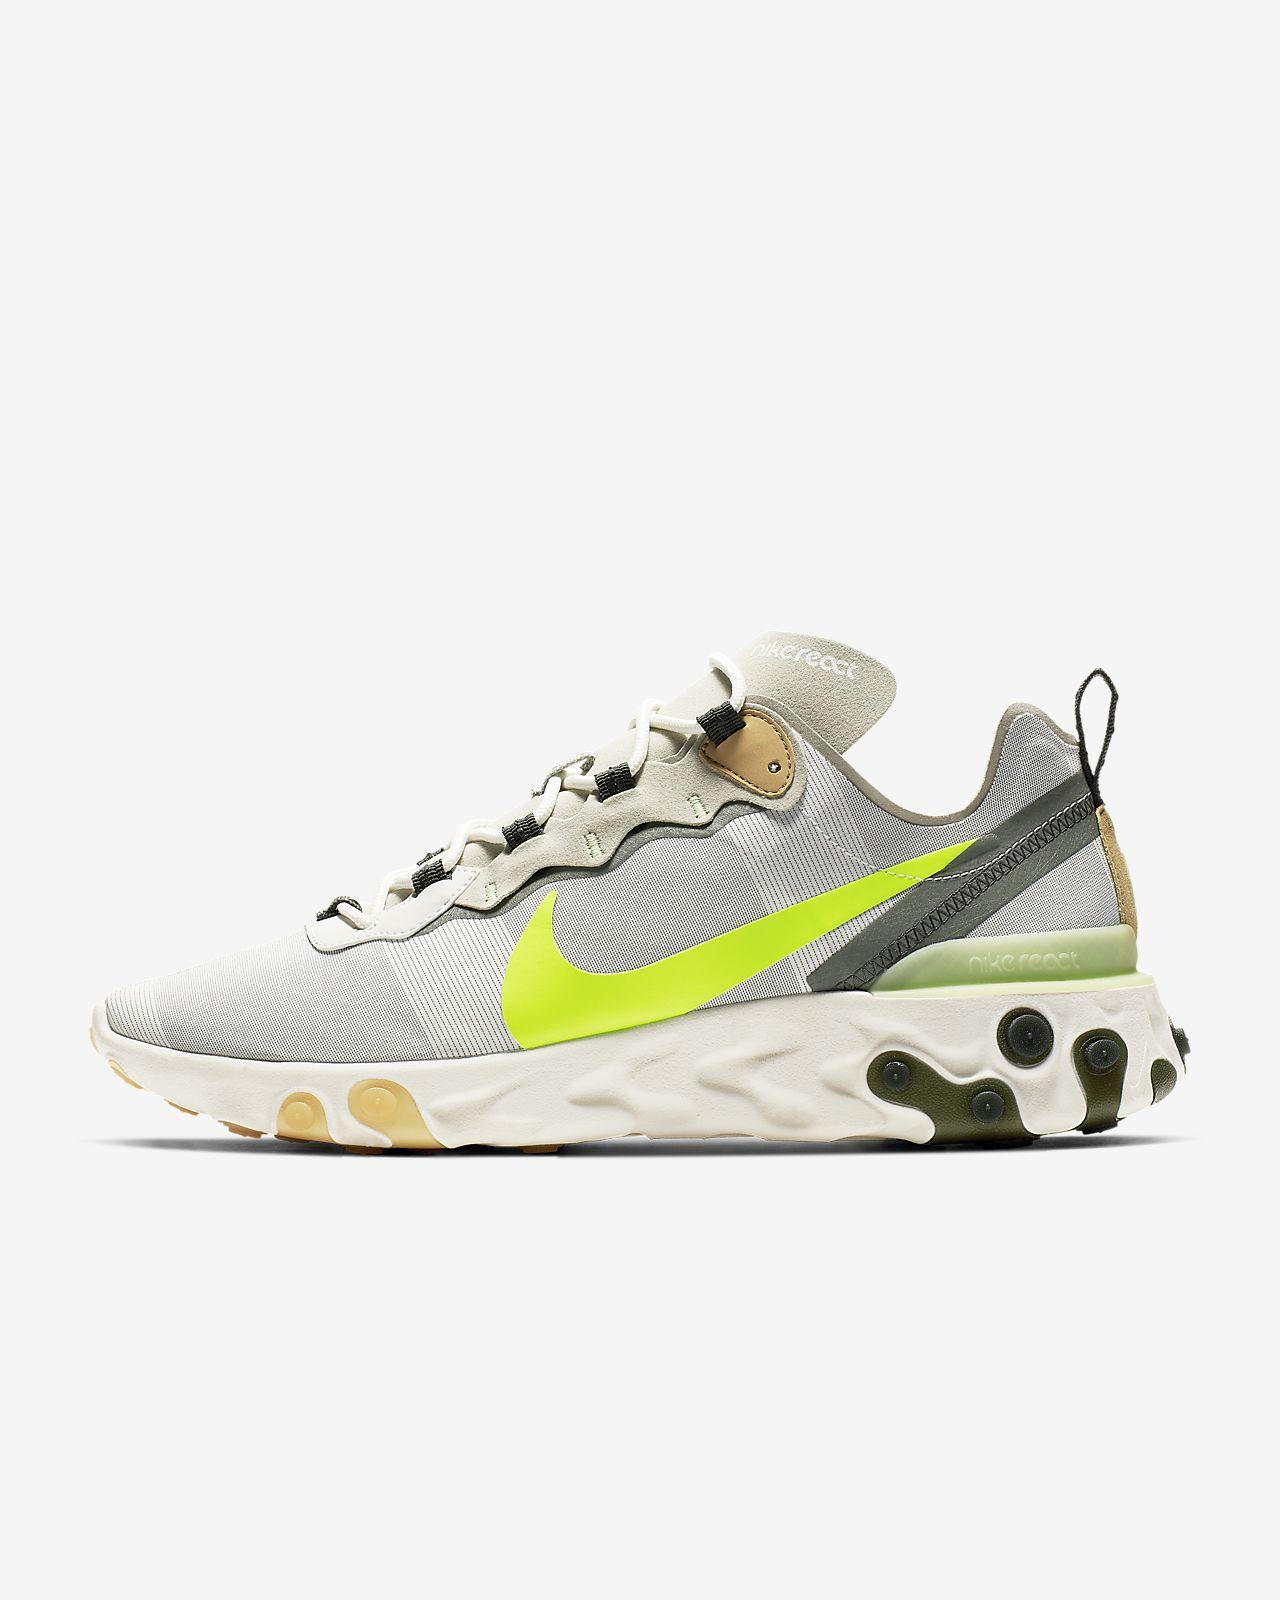 pretty nice d53db 7e21d ... Sko Nike React Element 55 för män